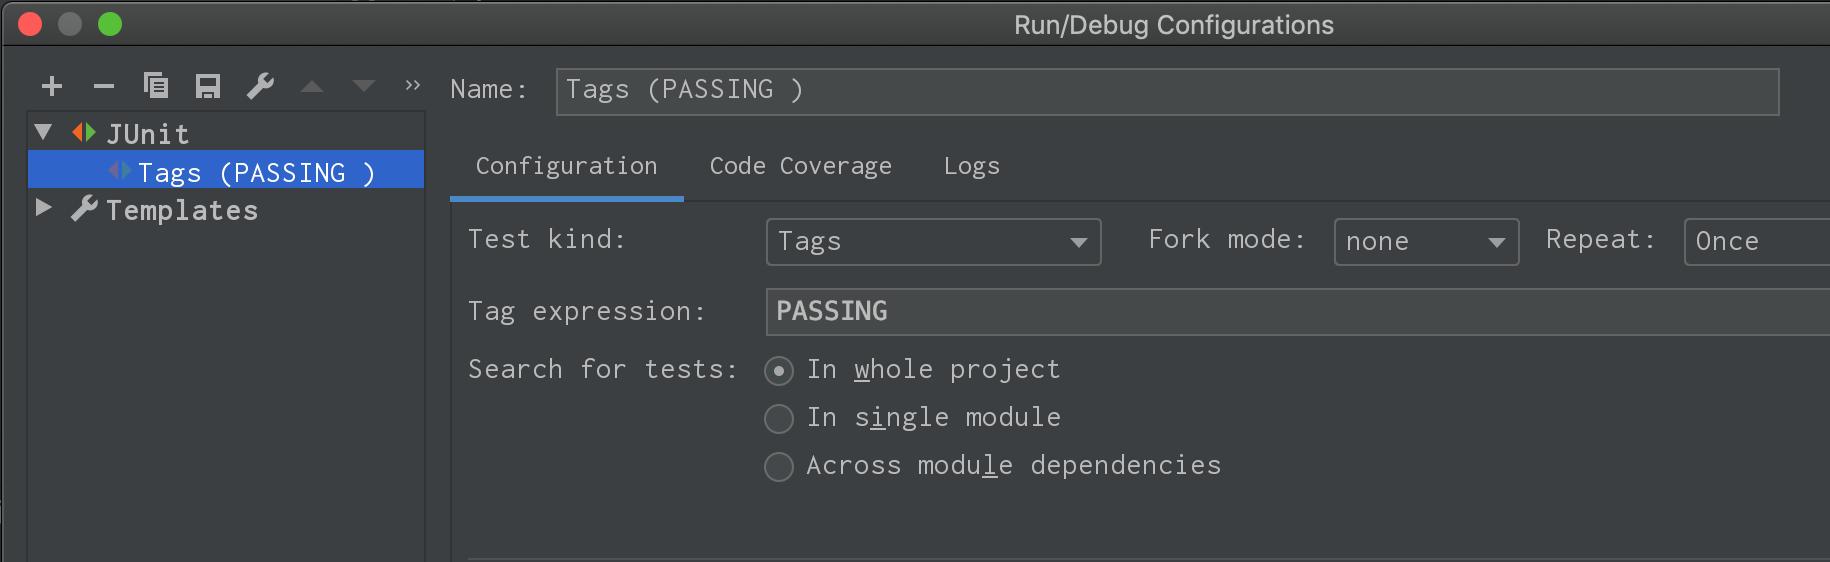 JUNitRunConfiguration